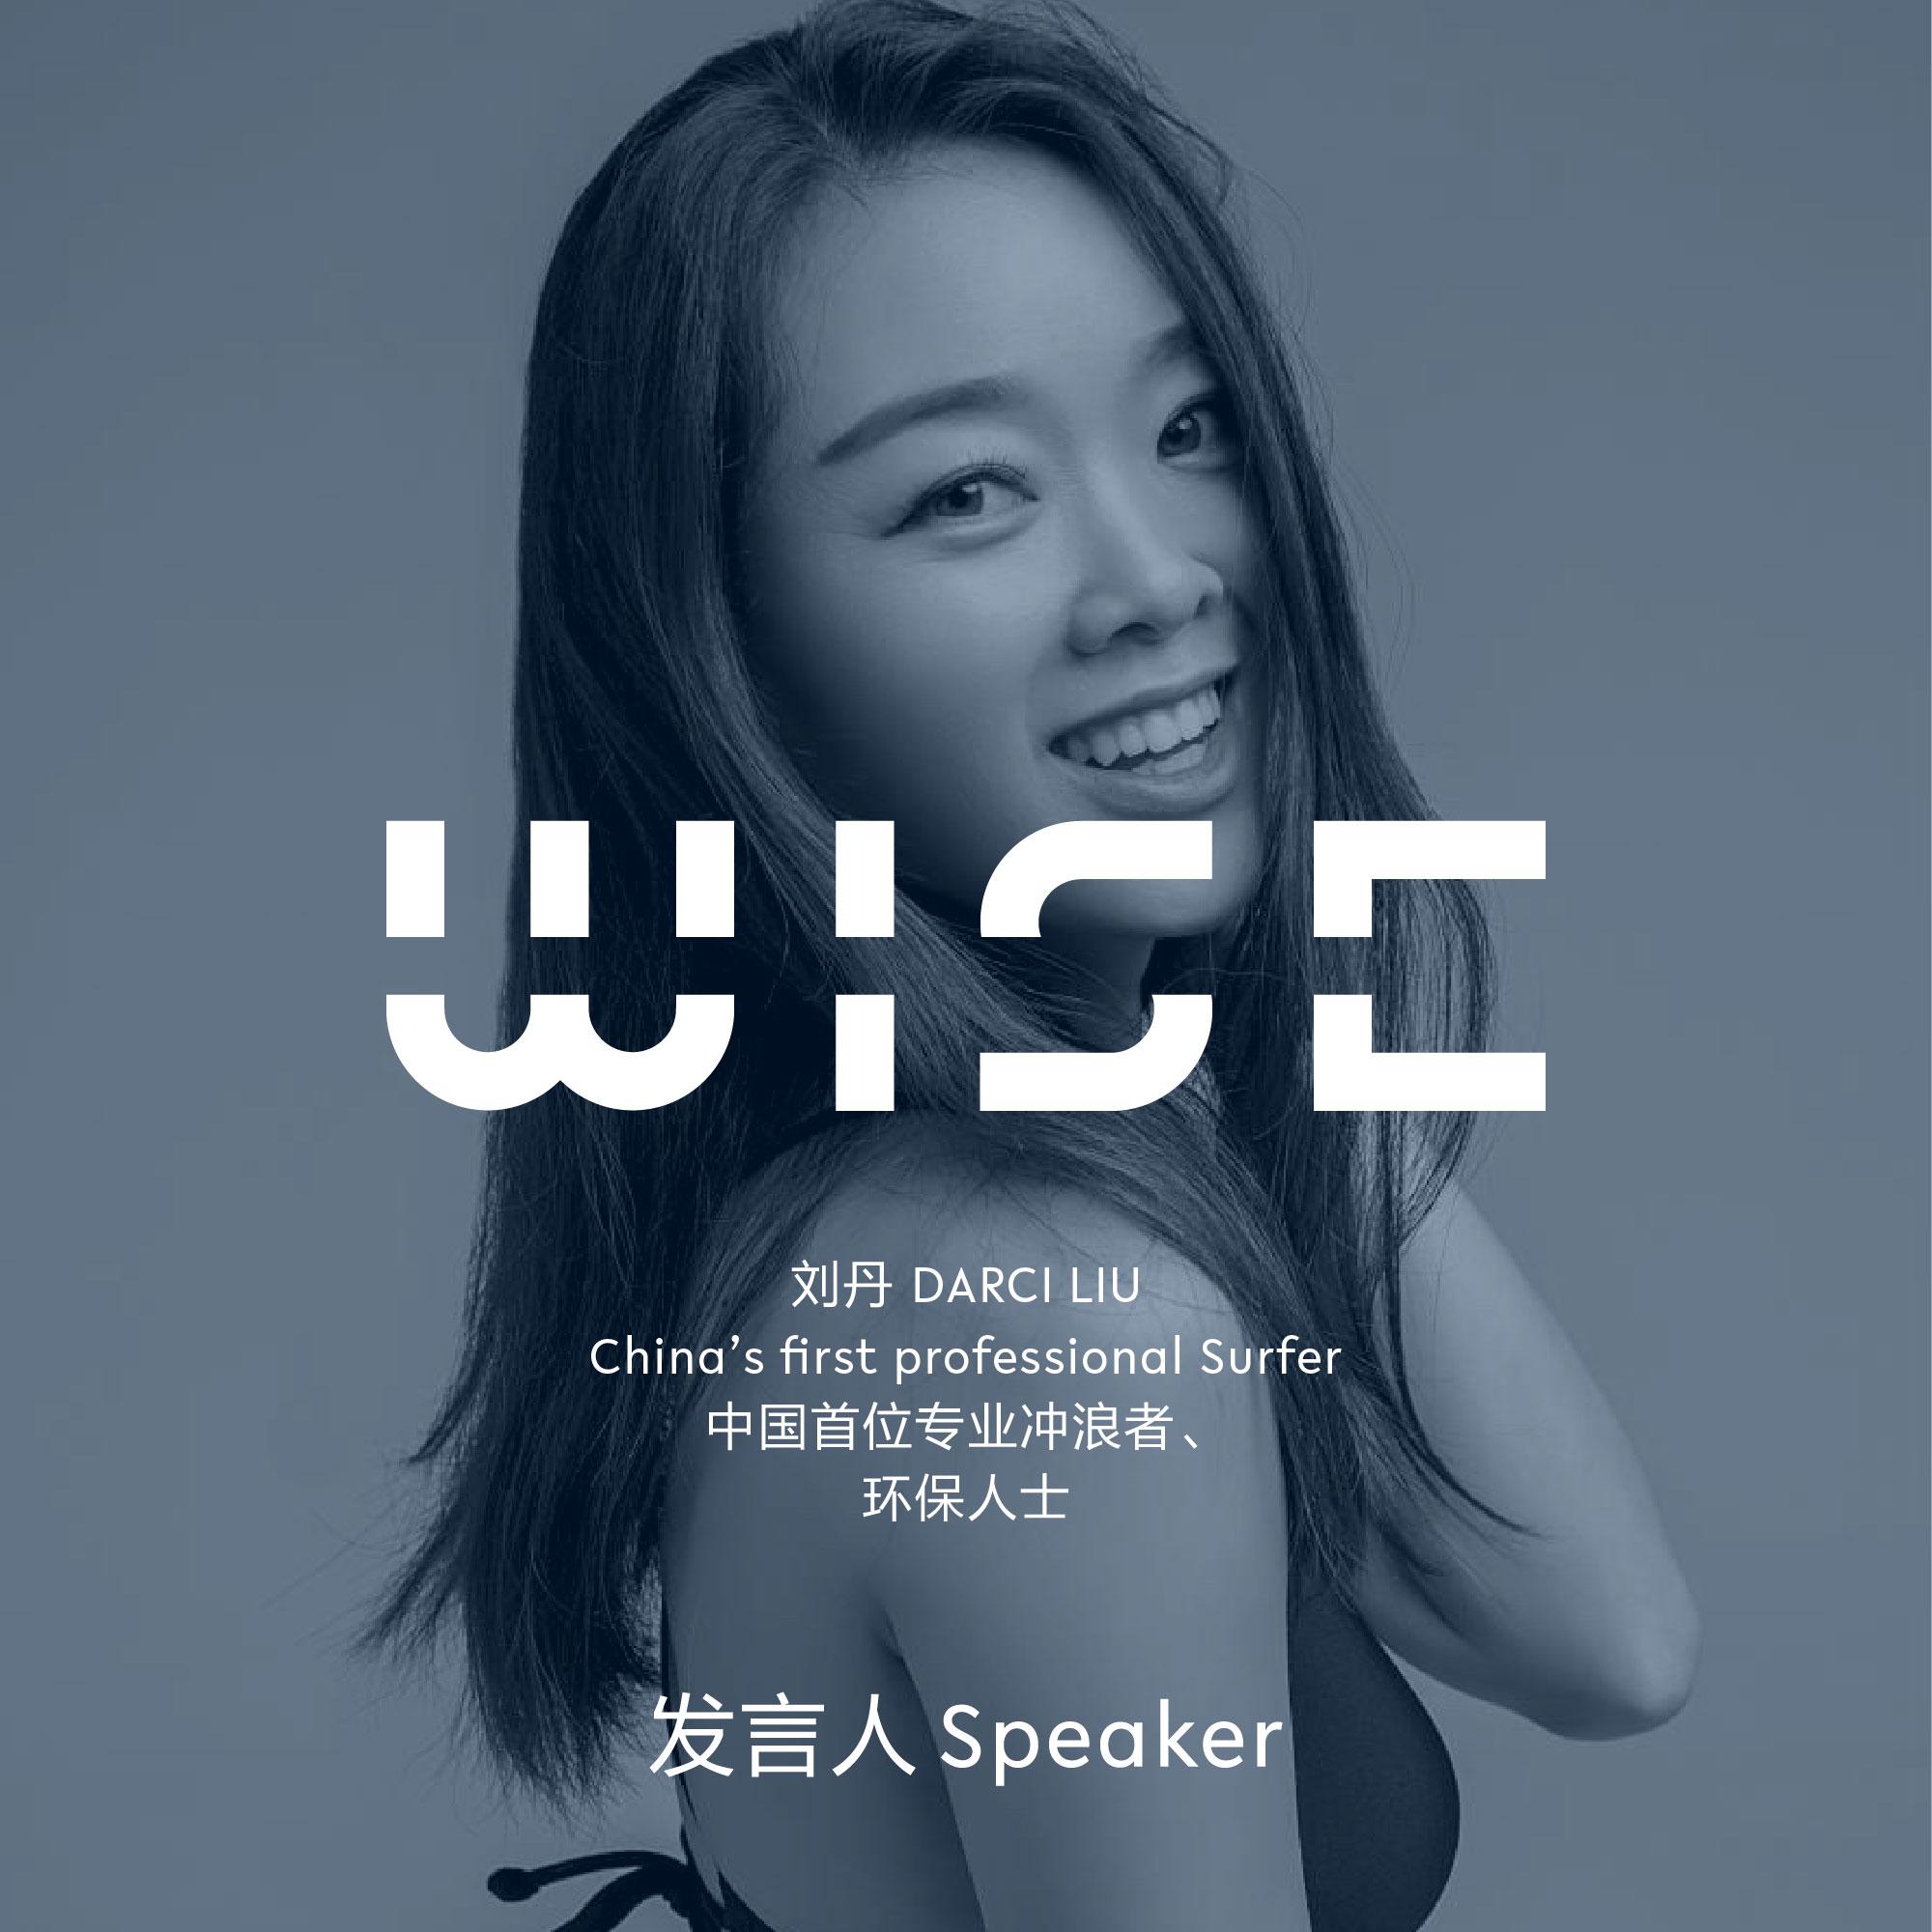 Darci Liu (China's First Professional Surfer)